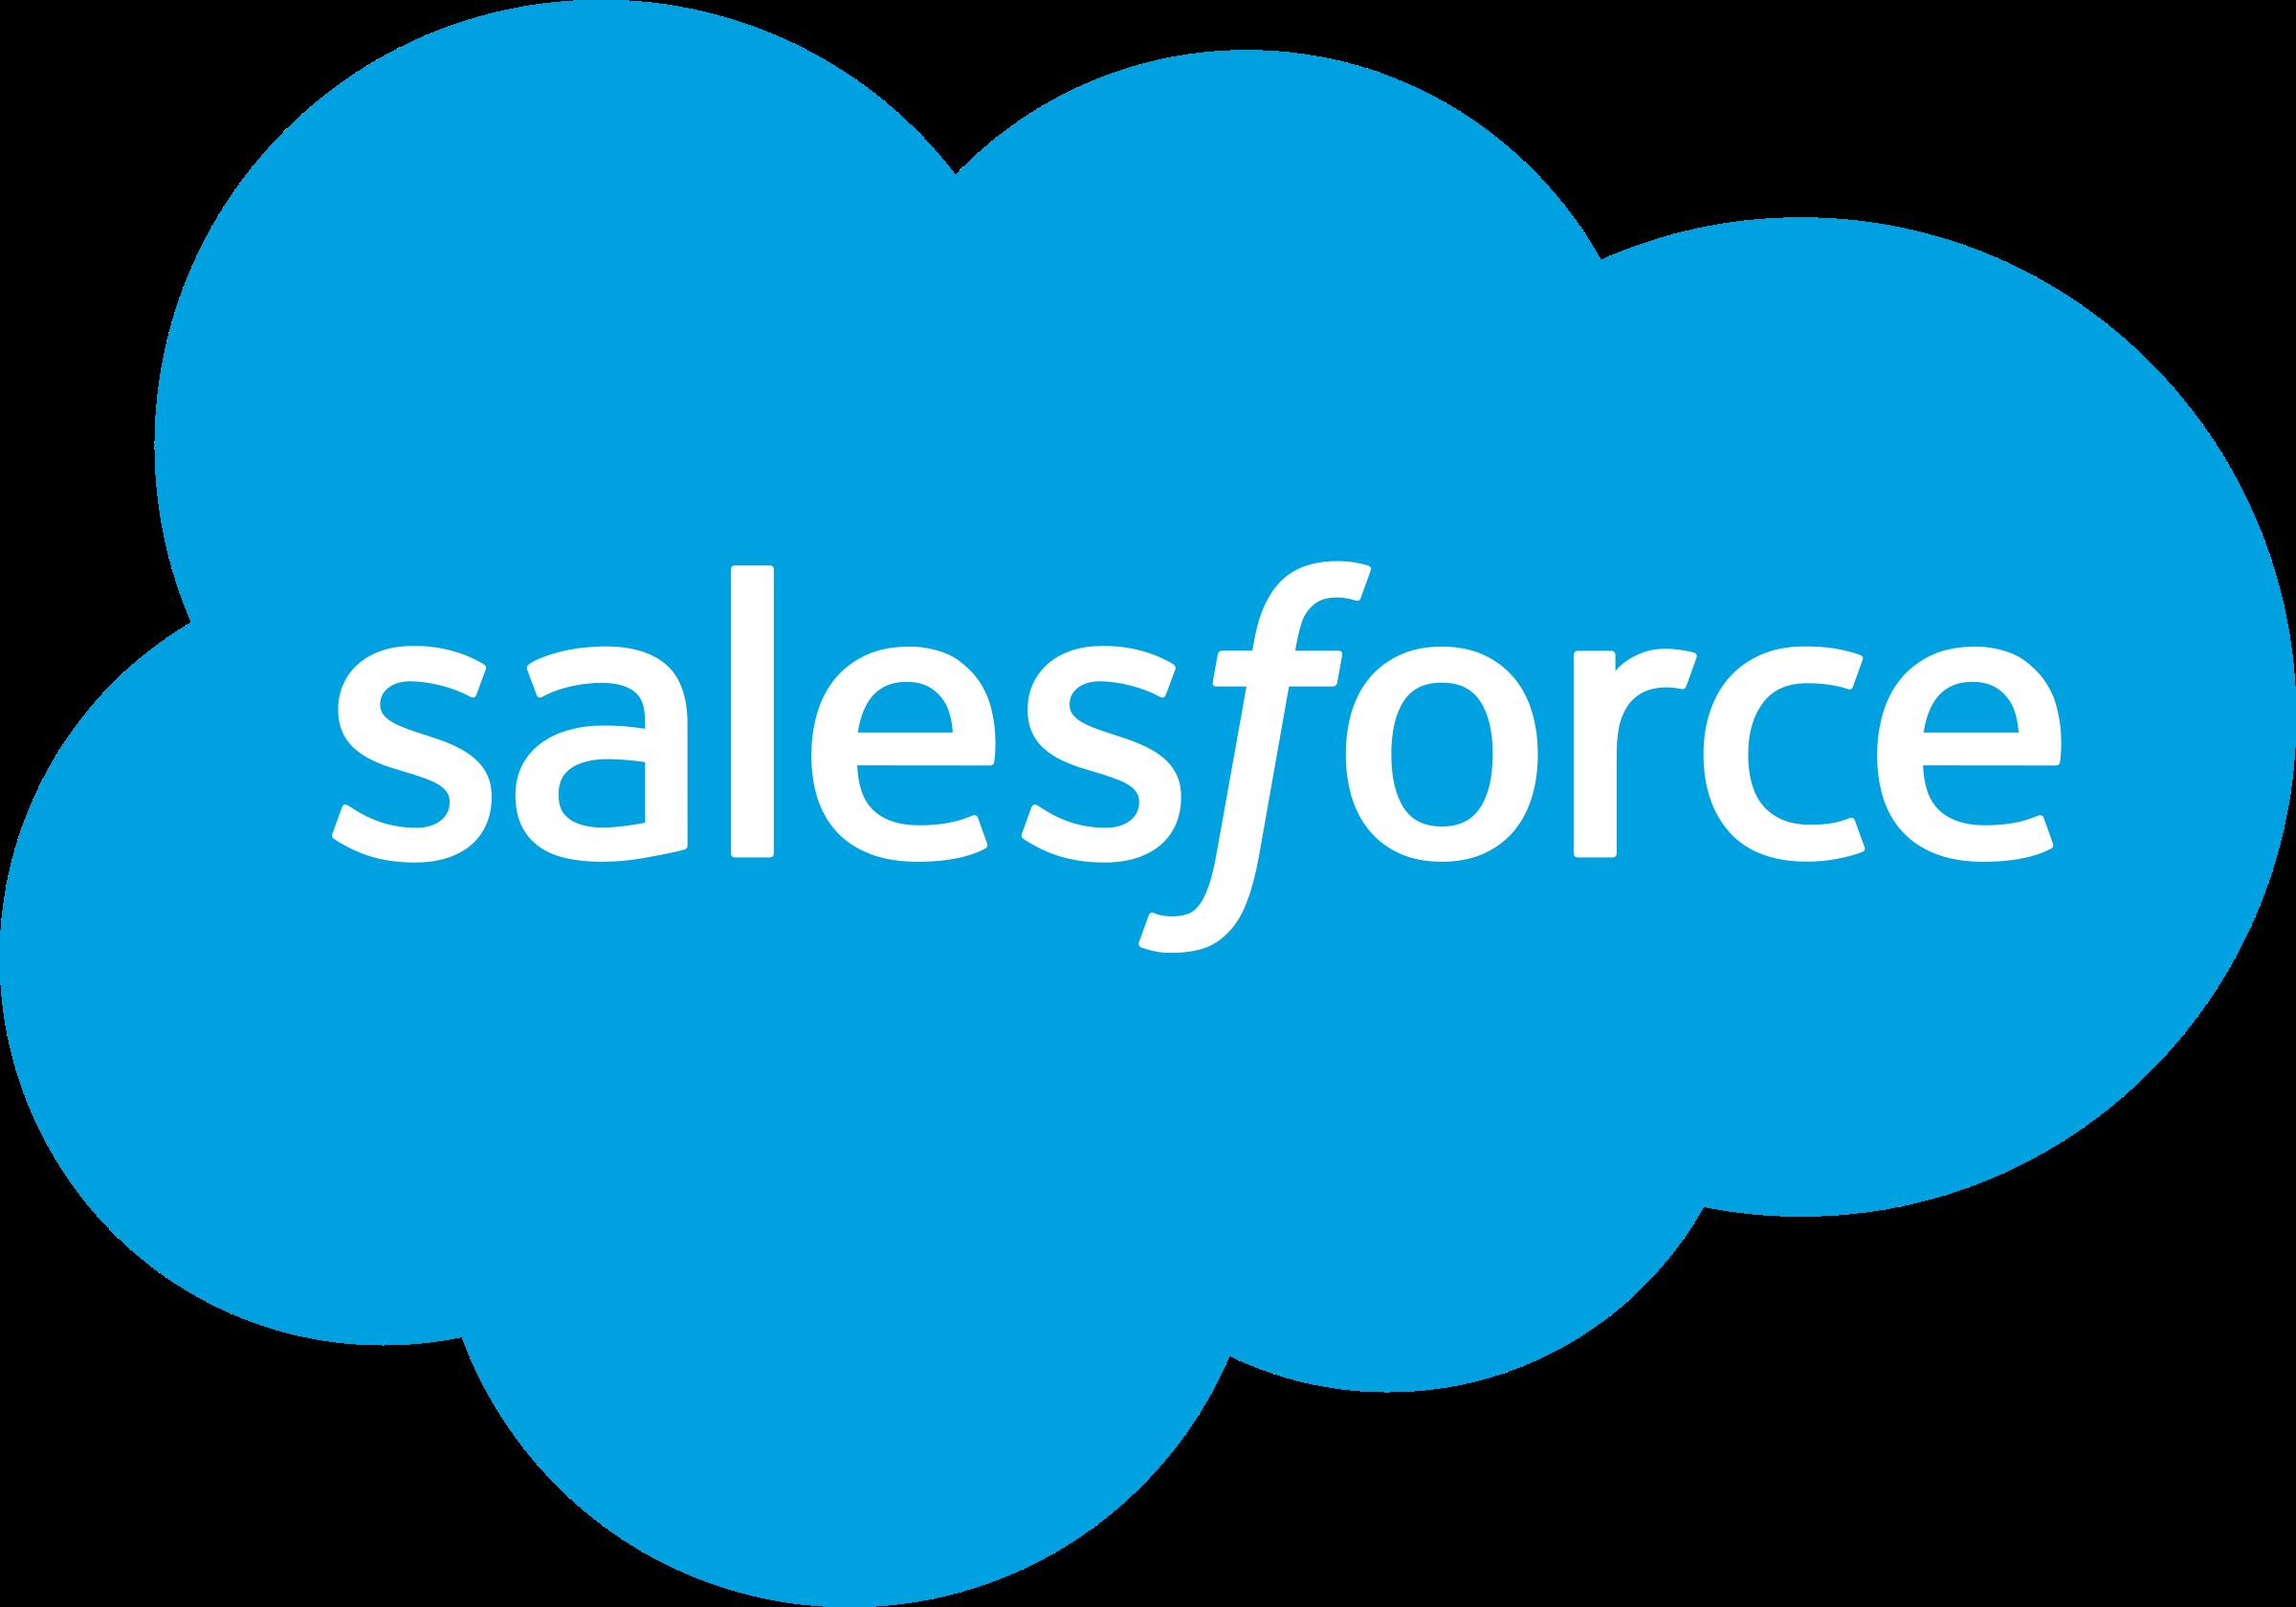 salesforce-2-logo-png-transparent